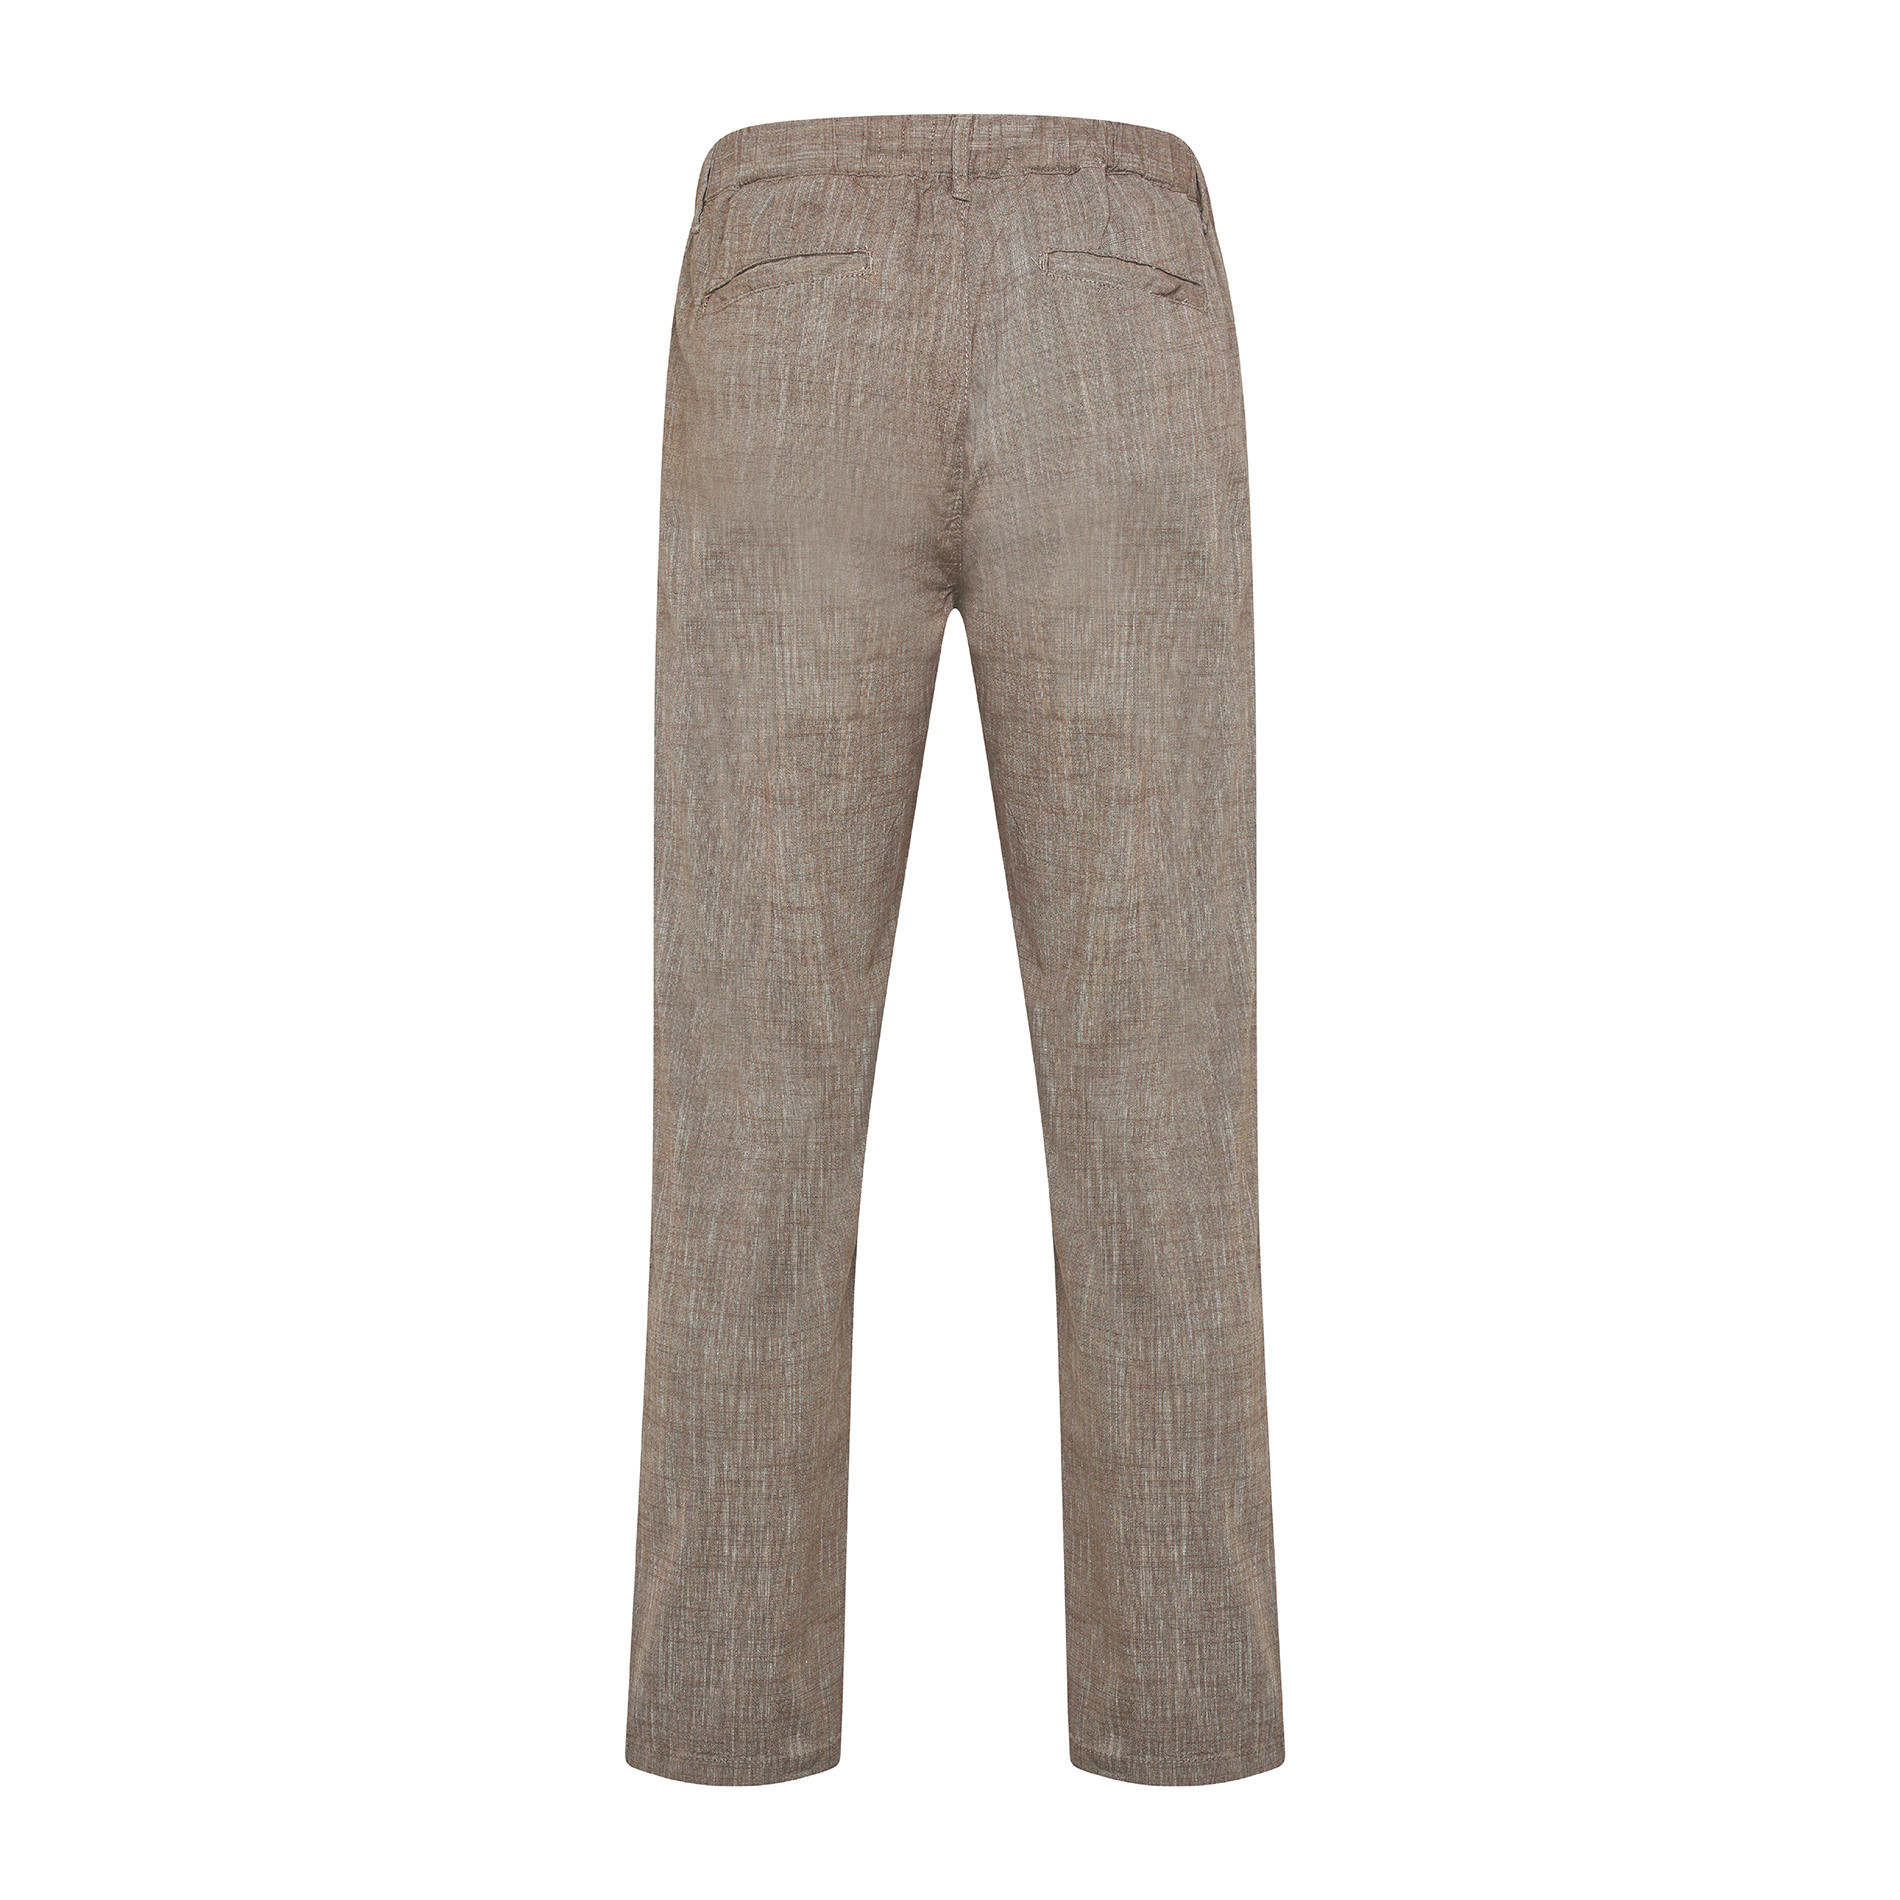 Pantalone puro cotone light JCT, Beige, large image number 1